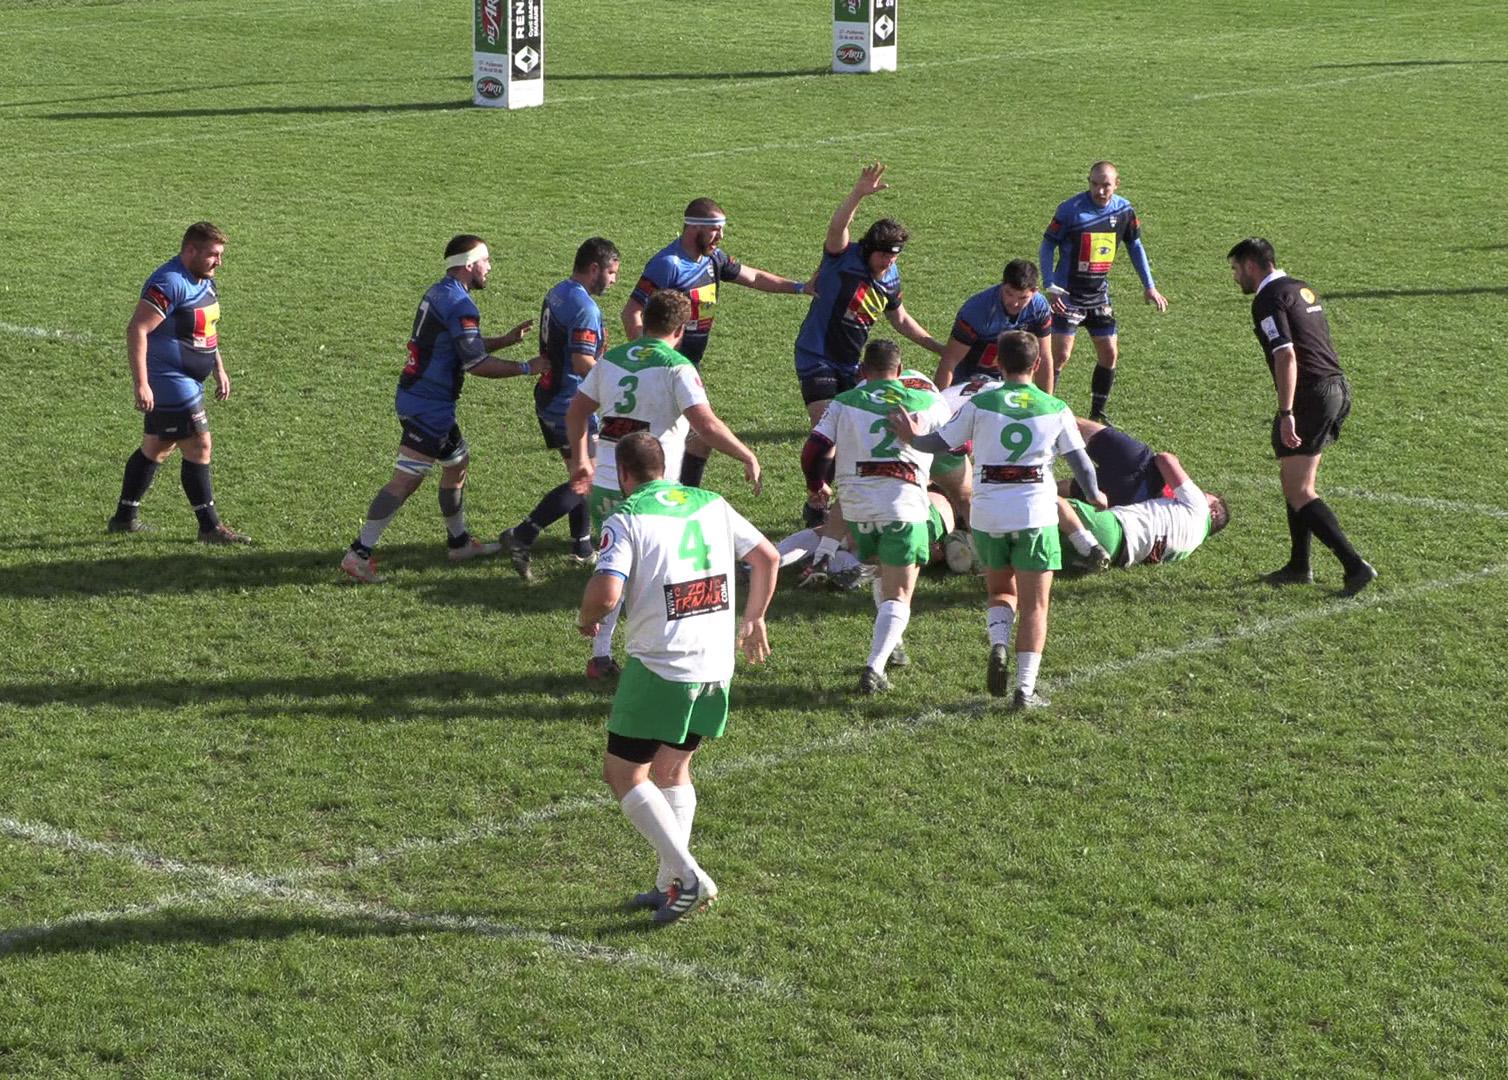 Rugby clubs amateurs Marans ARM Ludovic Sarrazin